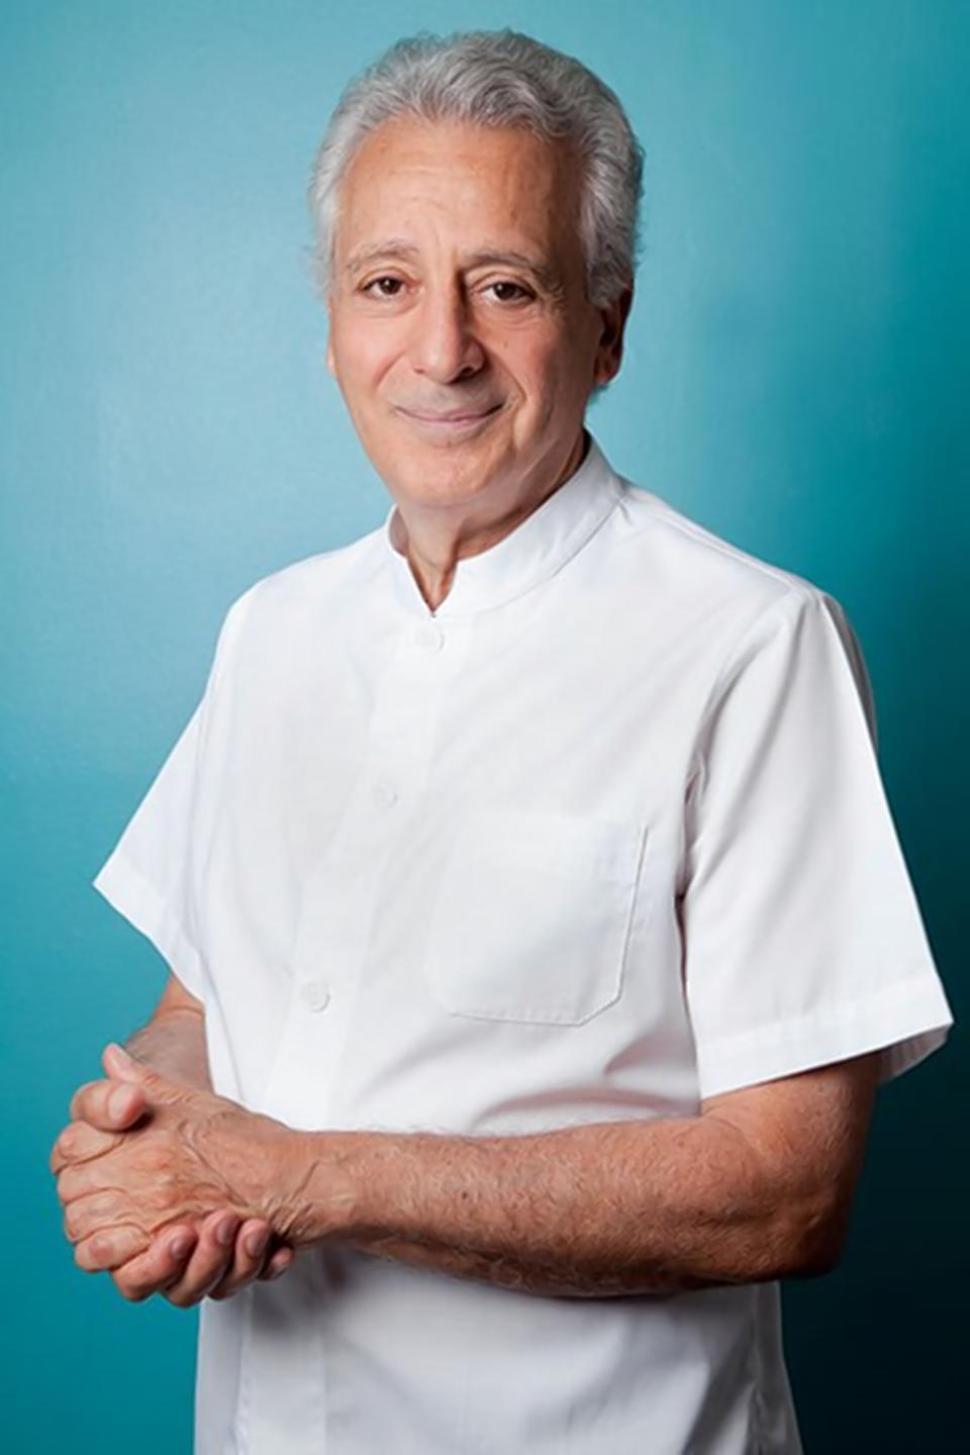 Диету французского диетолога дюкана